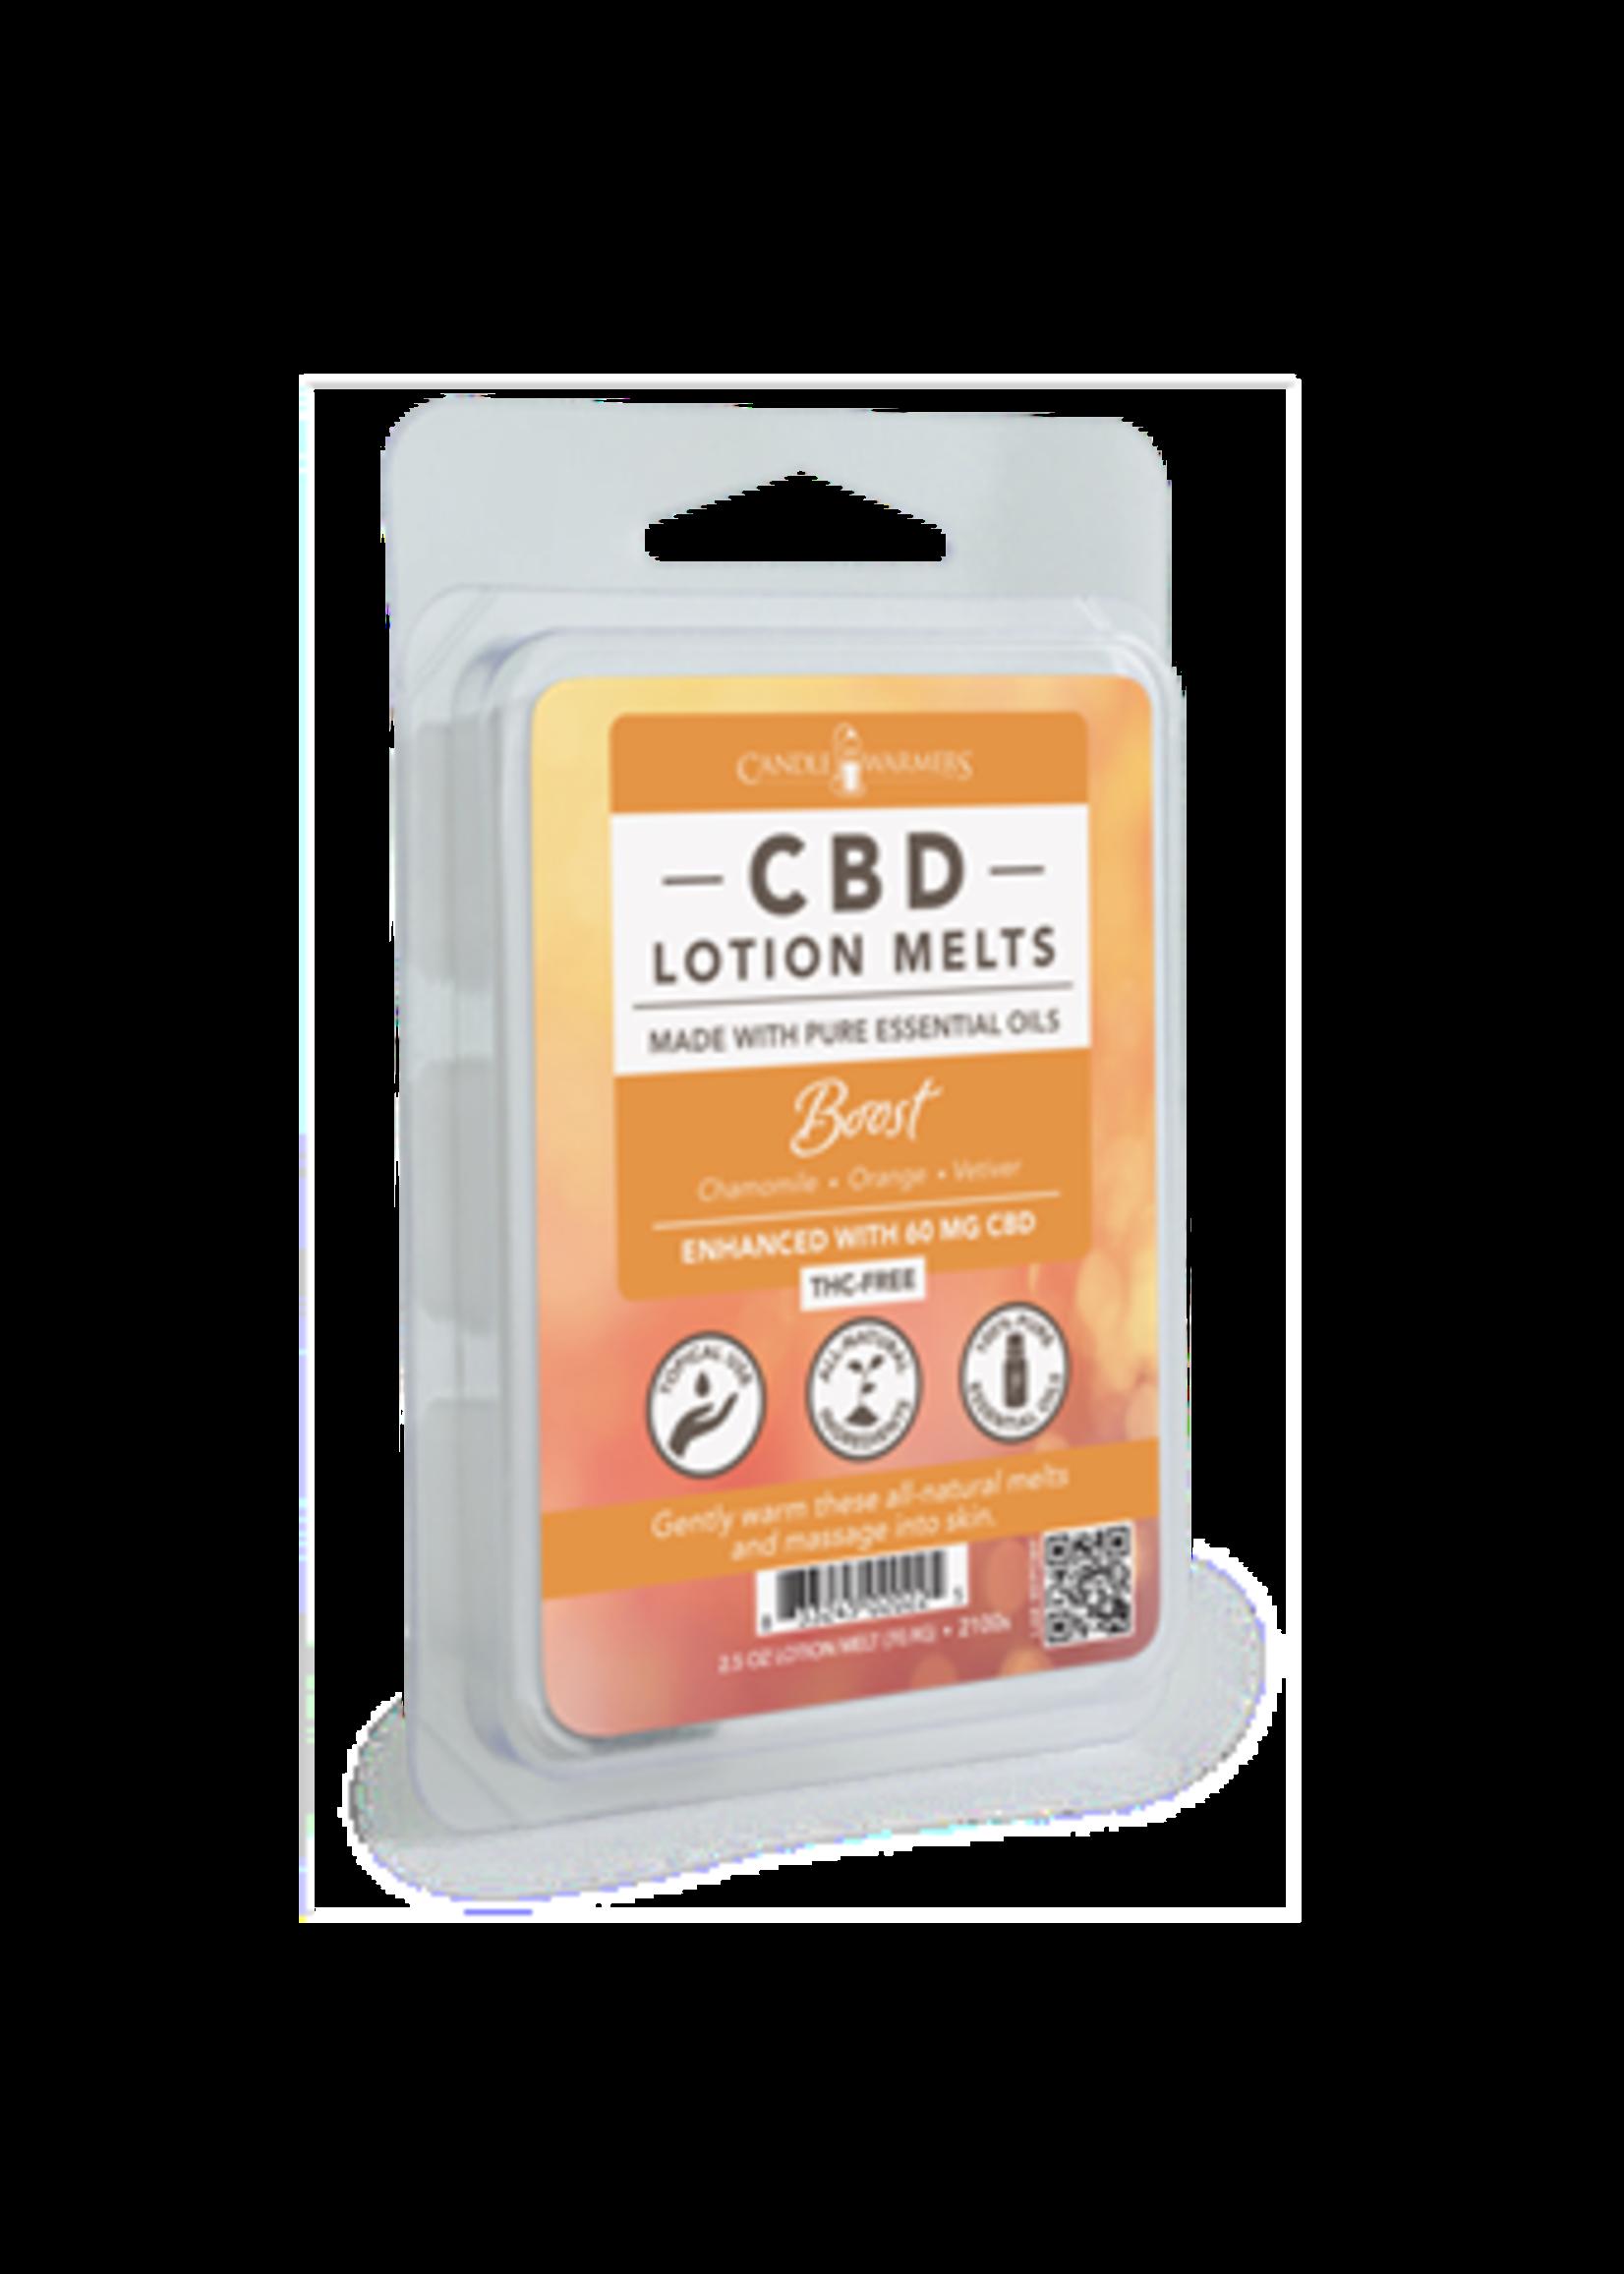 Candles Warmers Etc CBD Lotion Wax Melt Boost 2.5oz